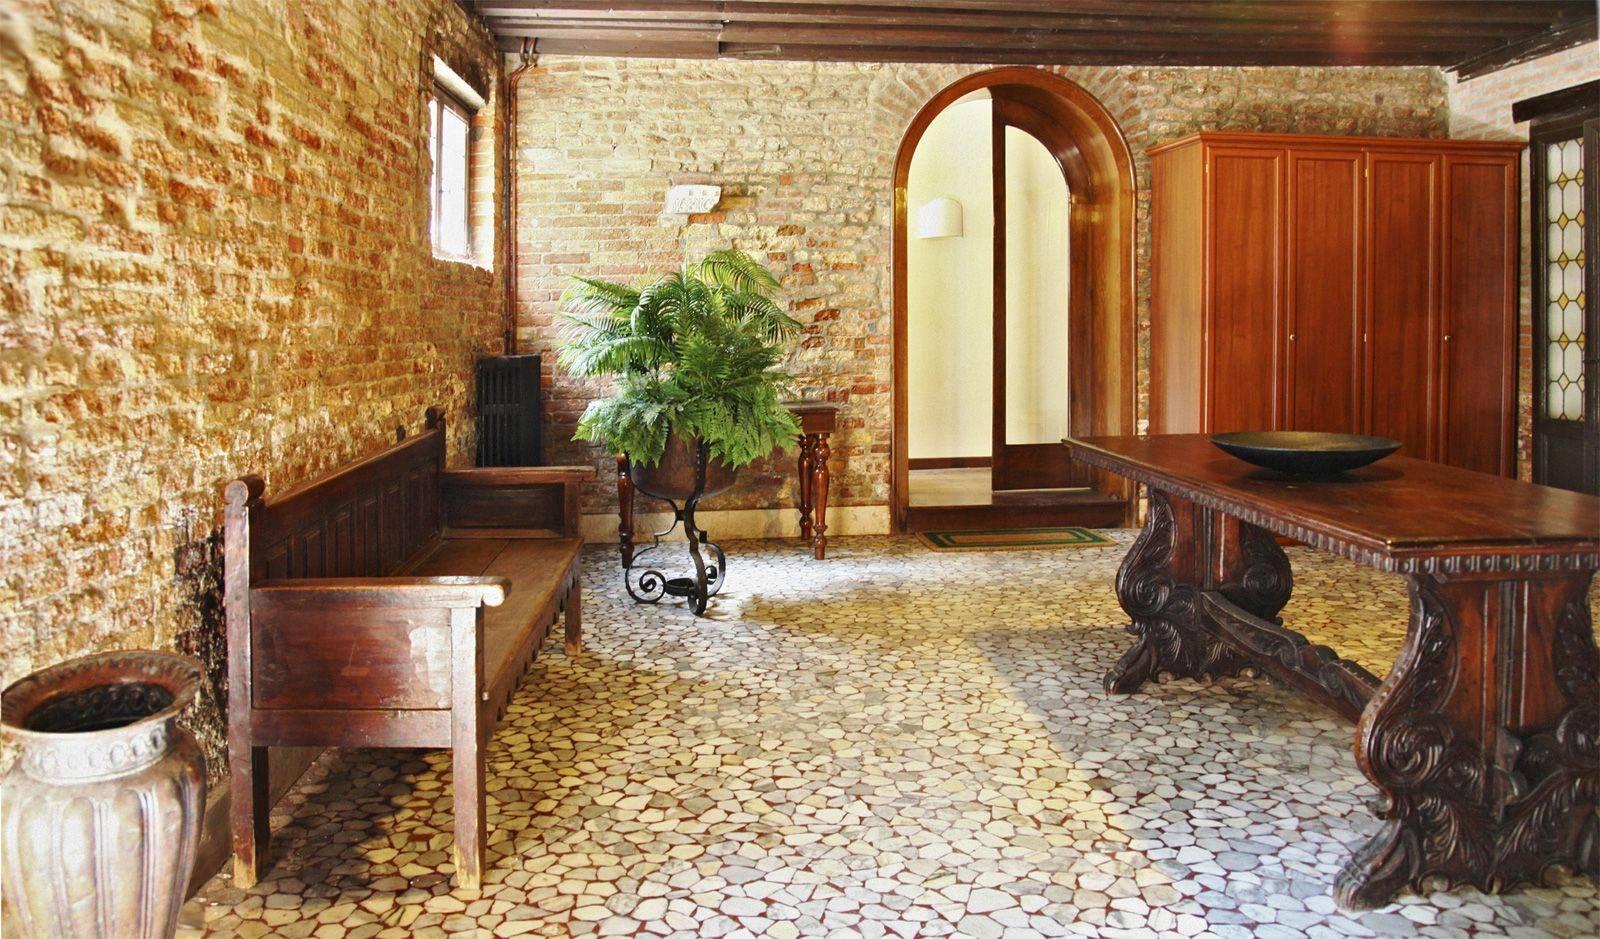 Michiel spacious and prestigious historical home in central location